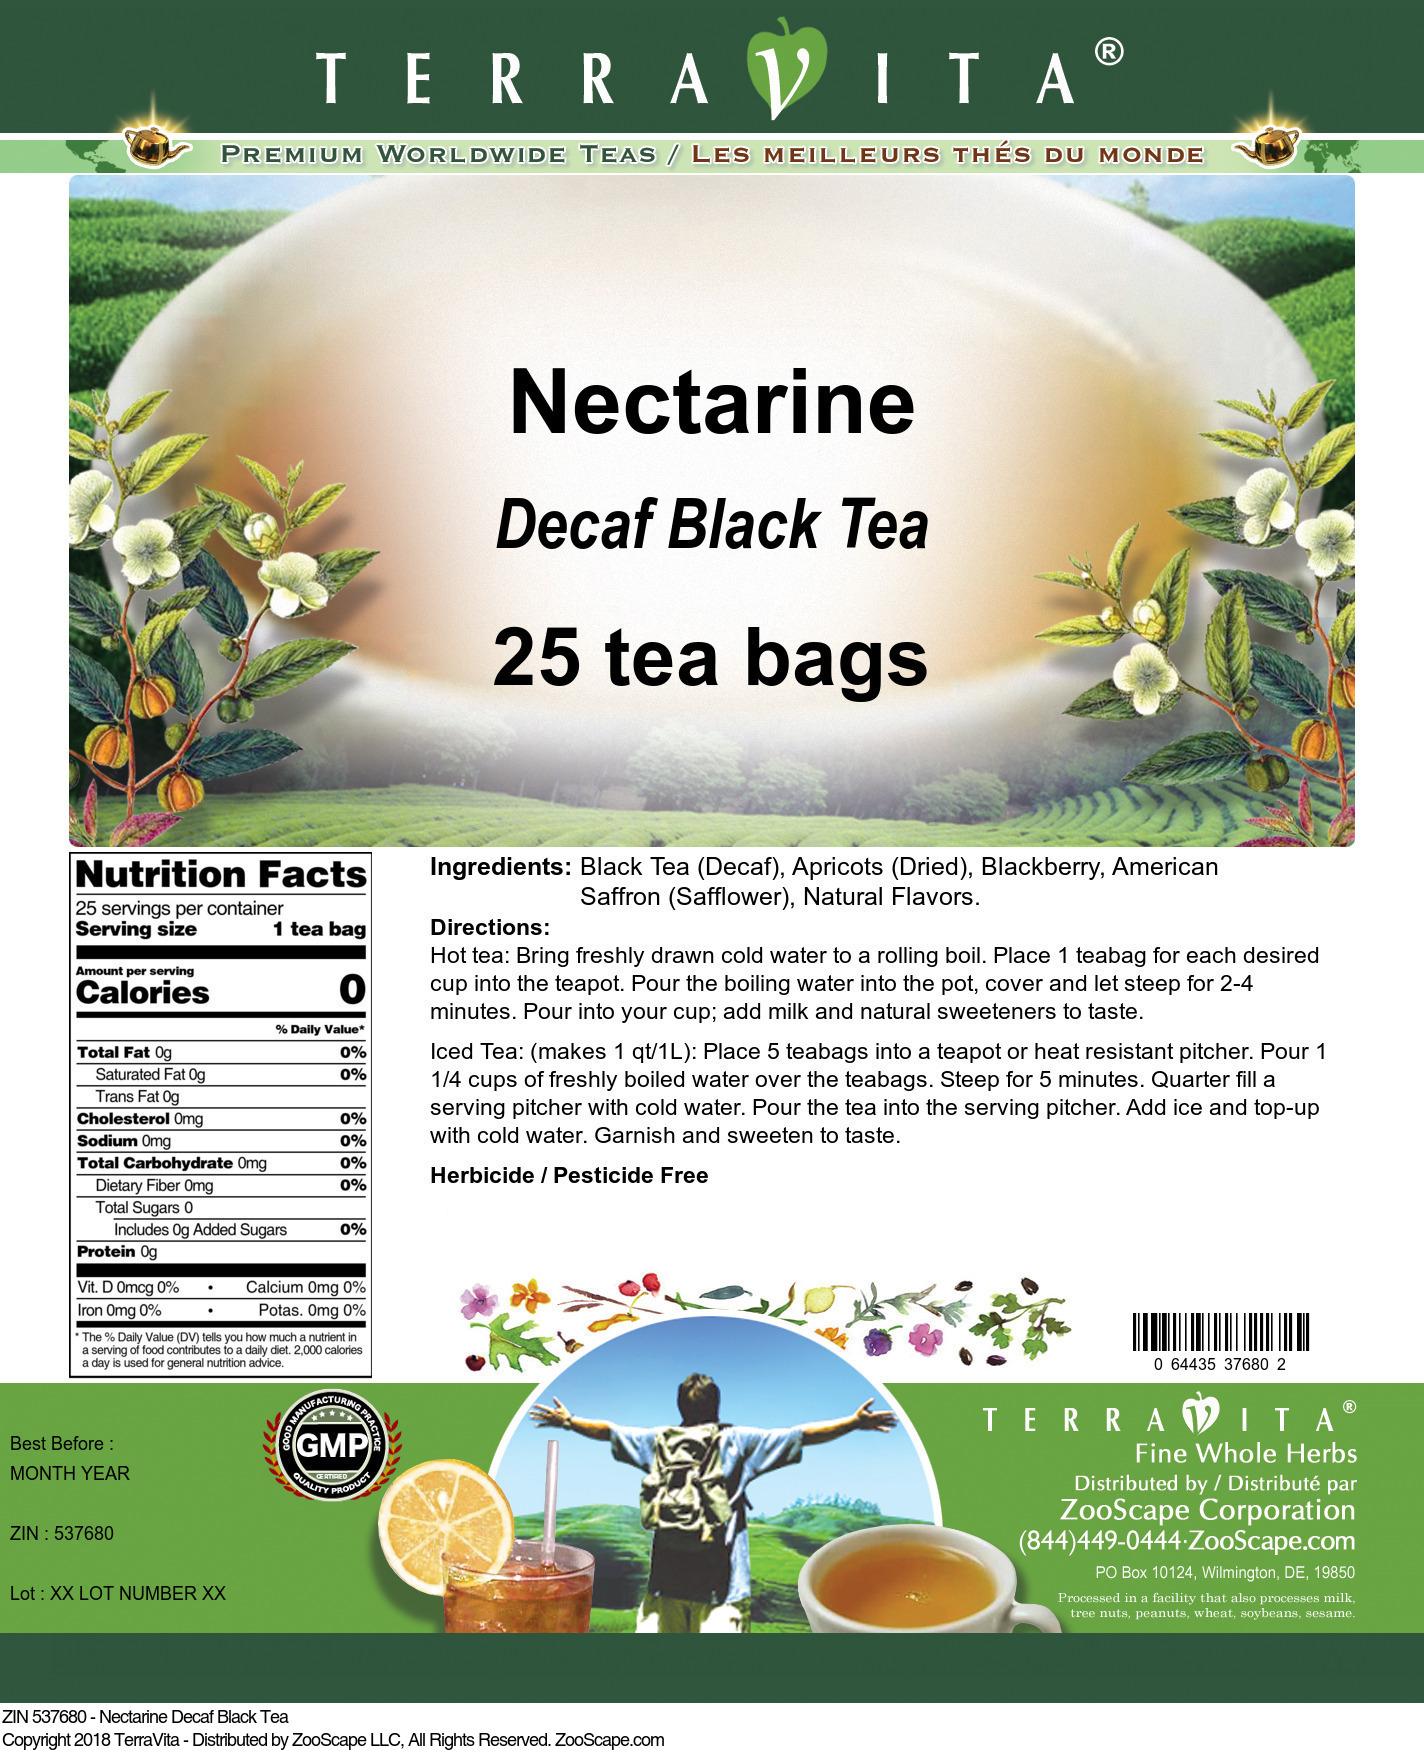 Nectarine Decaf Black Tea